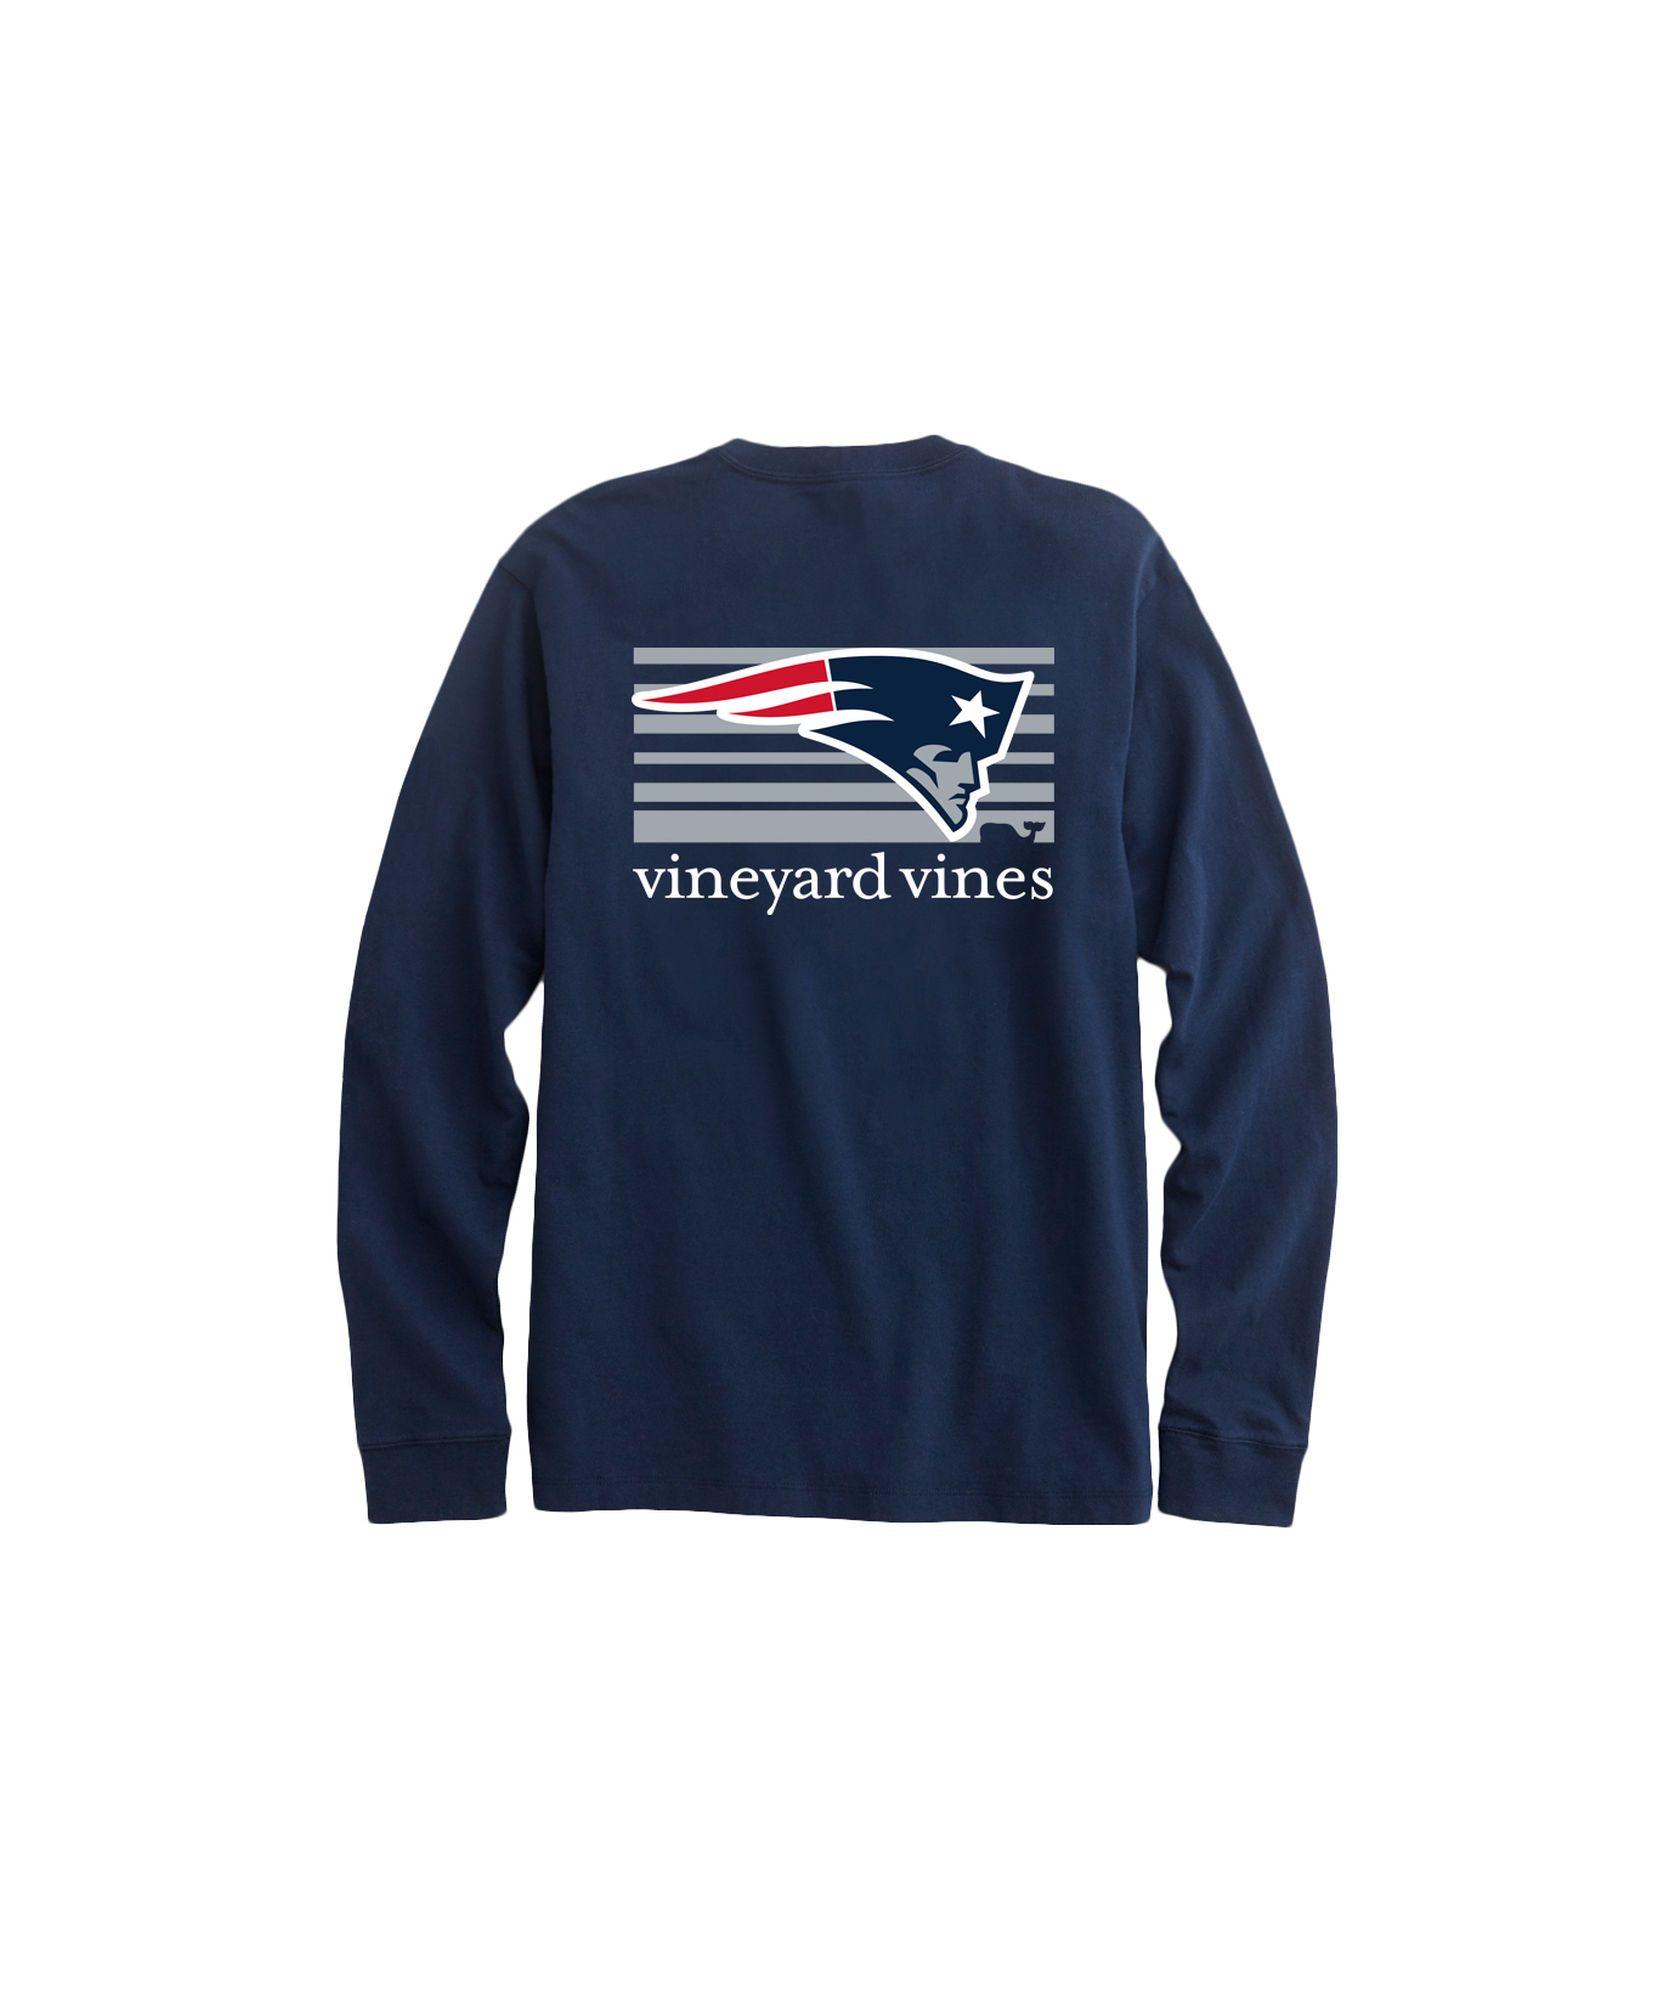 76d0e9e346d Vineyard Vines Adult Long-Sleeve New England Patriots Long-Sleeve ...